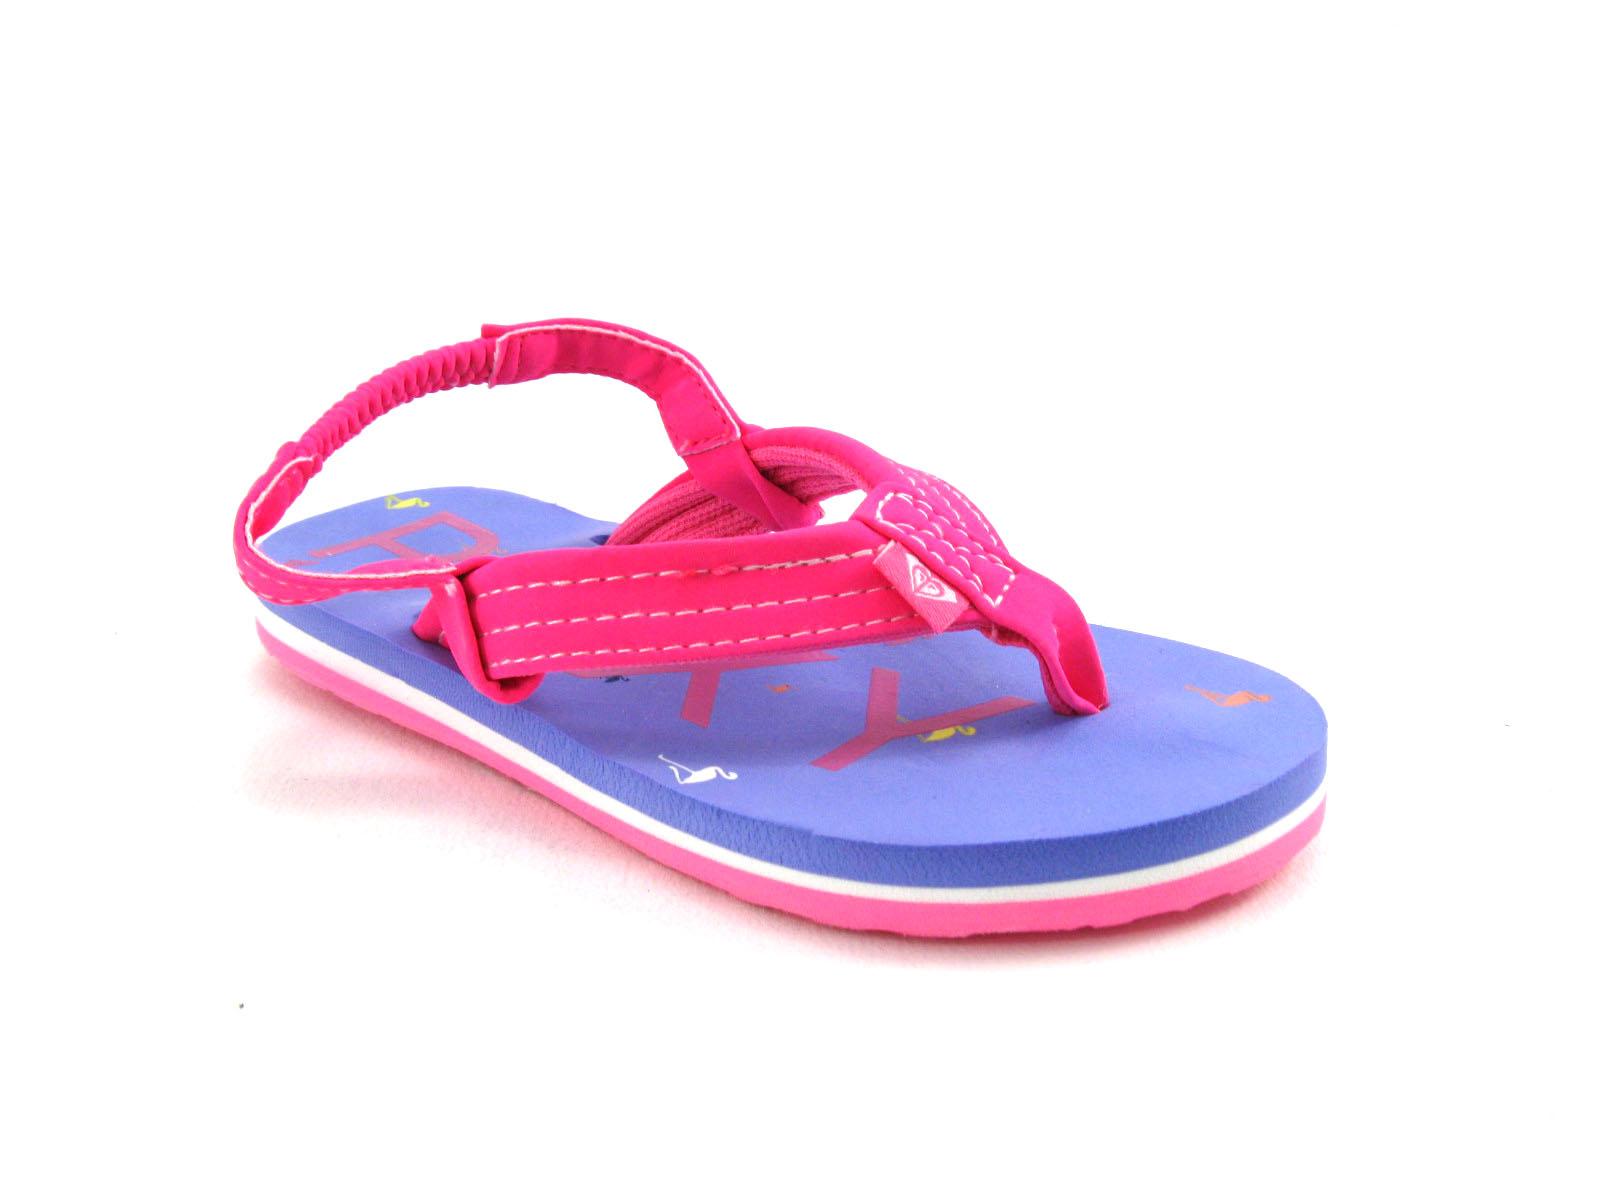 Chaussures piscine for Sandale adidas piscine